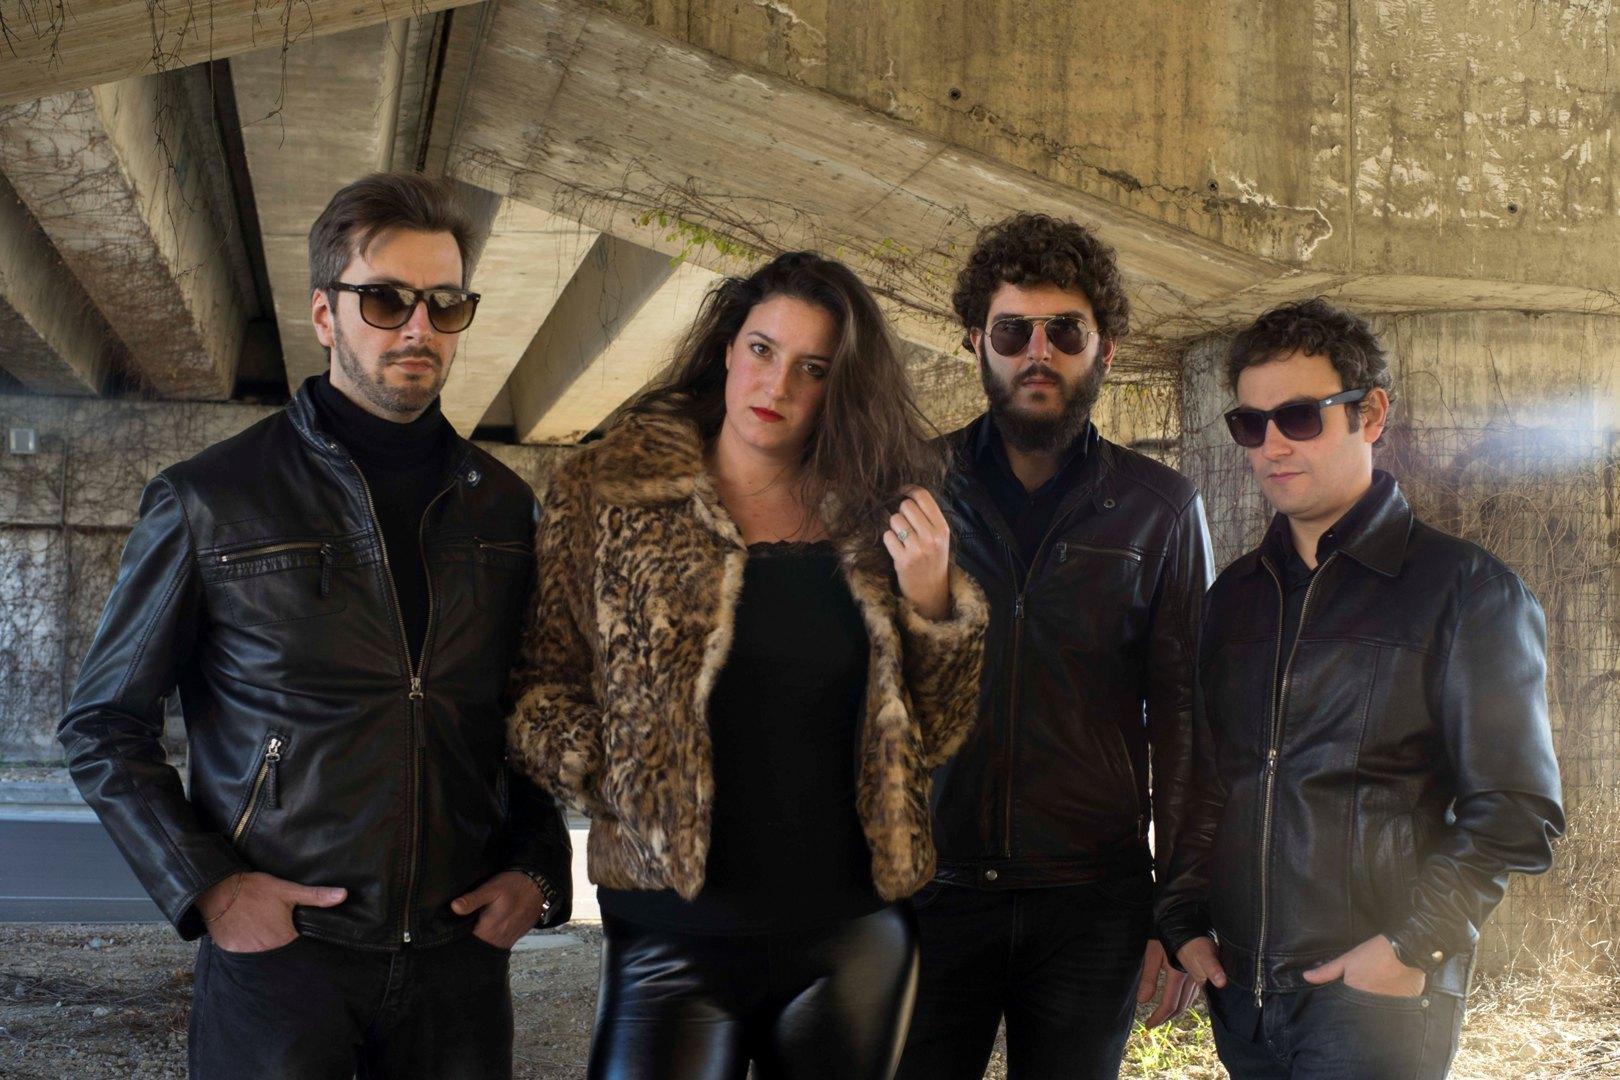 Bad-Blues-Quartet-by-Emanuela-Meloni